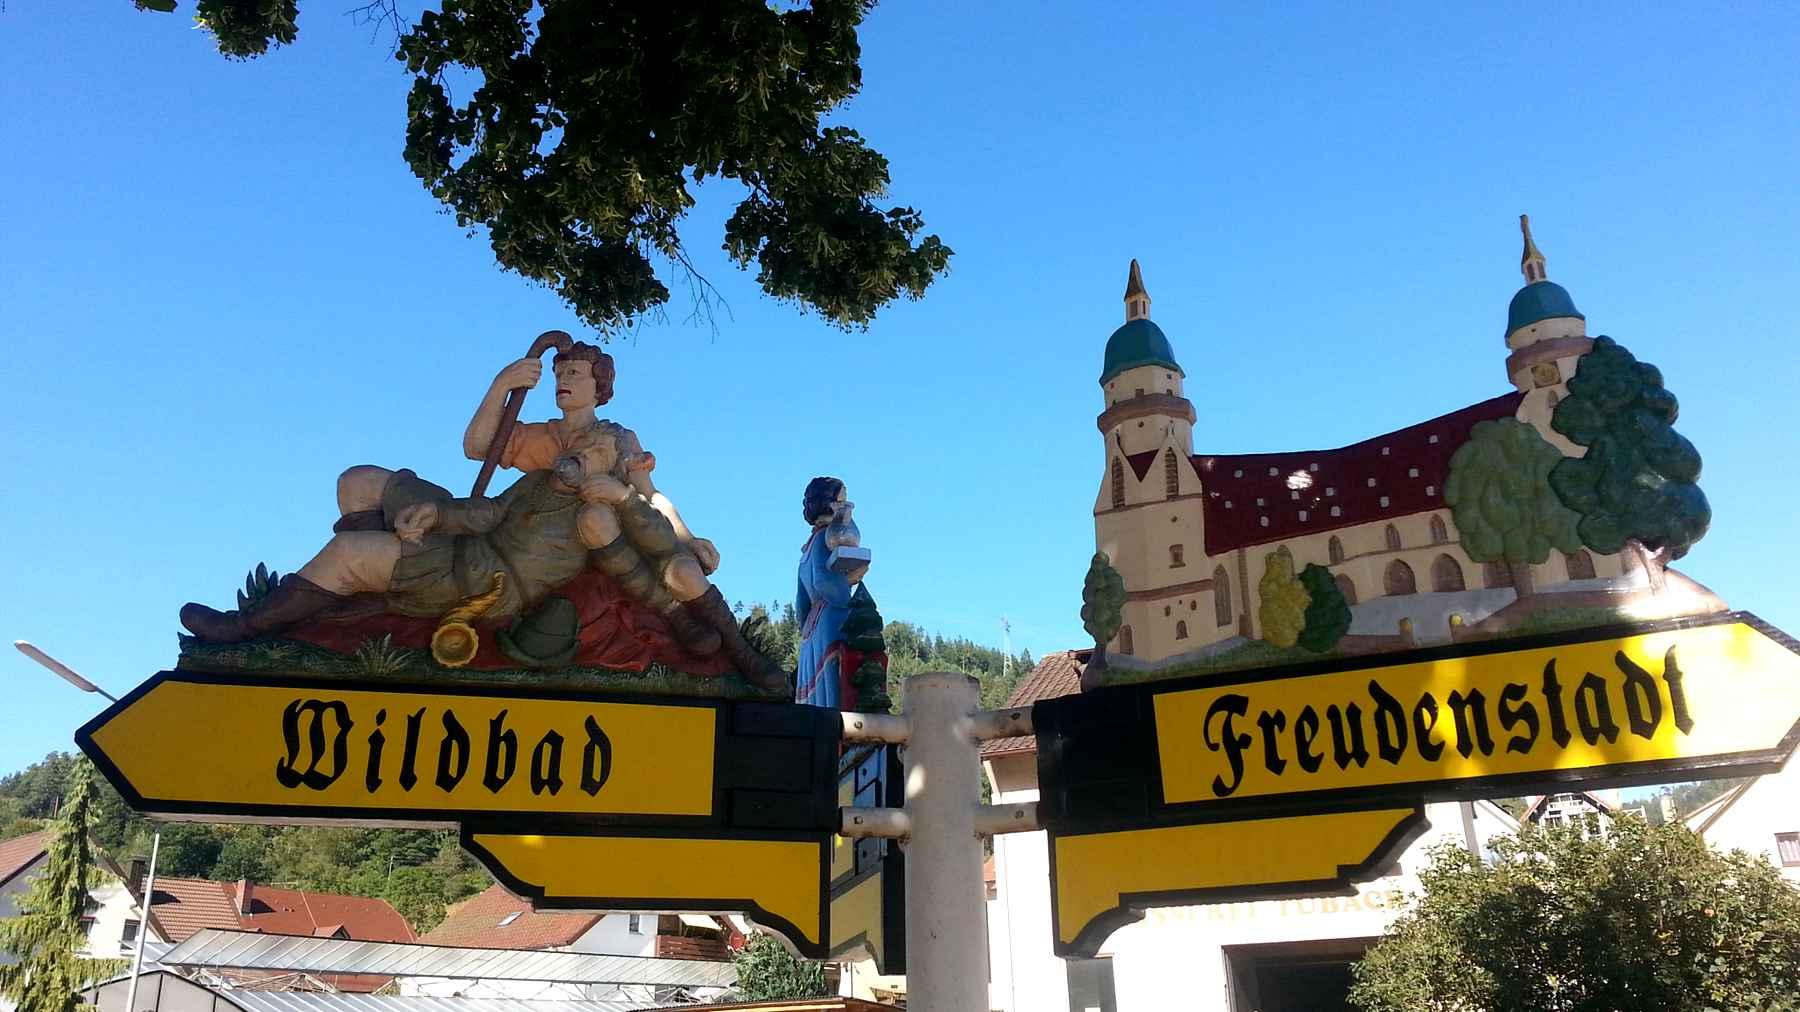 On the road: Freeriding Schwarzwald nahe Bad Wildbad, e- Fatbike Haibike Fullfat Six